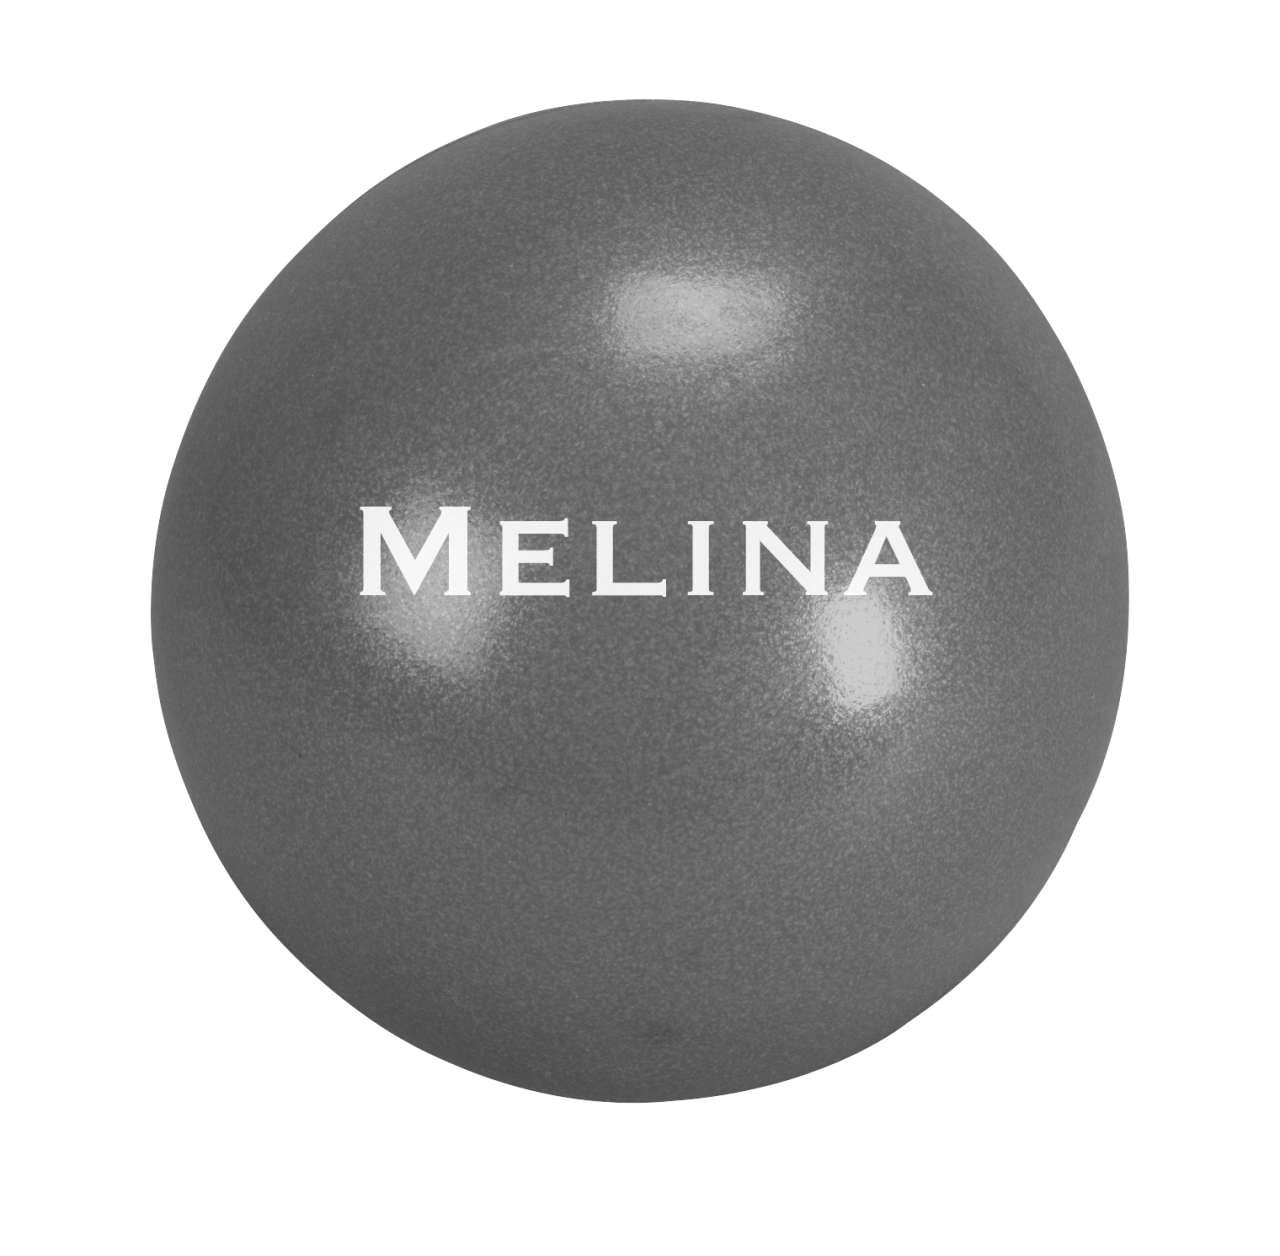 TRENDYSPORT Trendy Pilatesball Melina Blau, 25cm Durchmesser 1 Stück